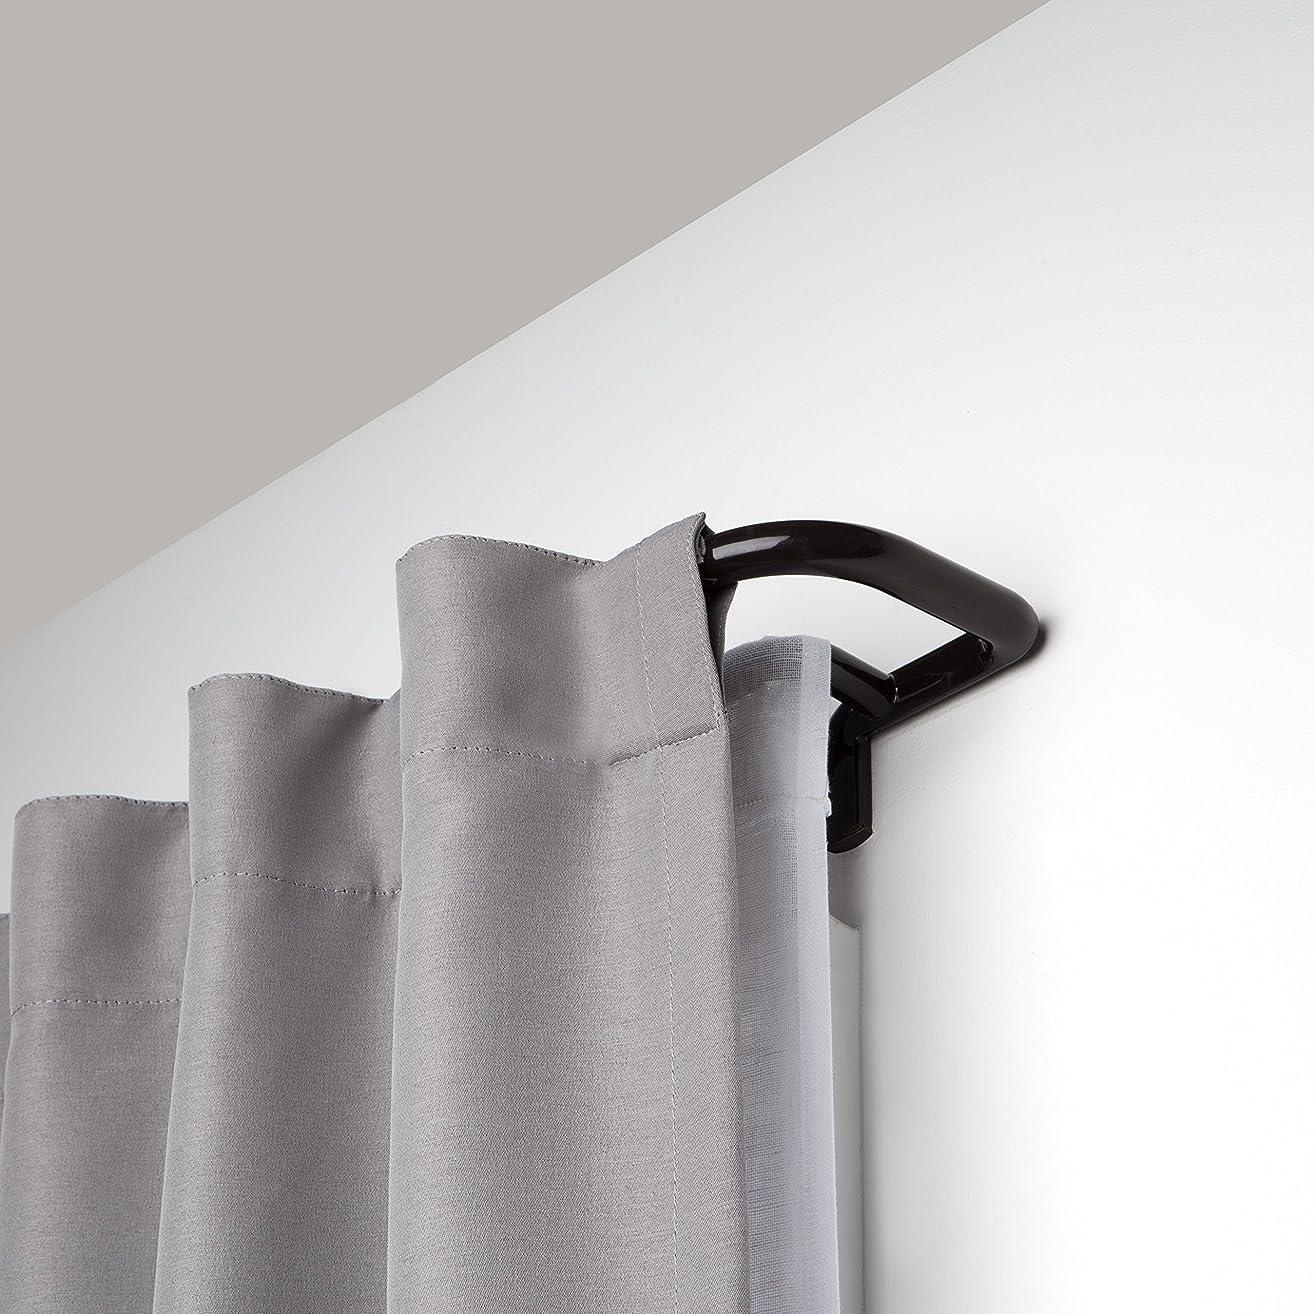 Umbra Twilight Double Rod Set – Wrap Around Design is Ideal for Blackout Room Darkening Curtains, 28 to 48 Inch, Auburn Bronze, 48-inch